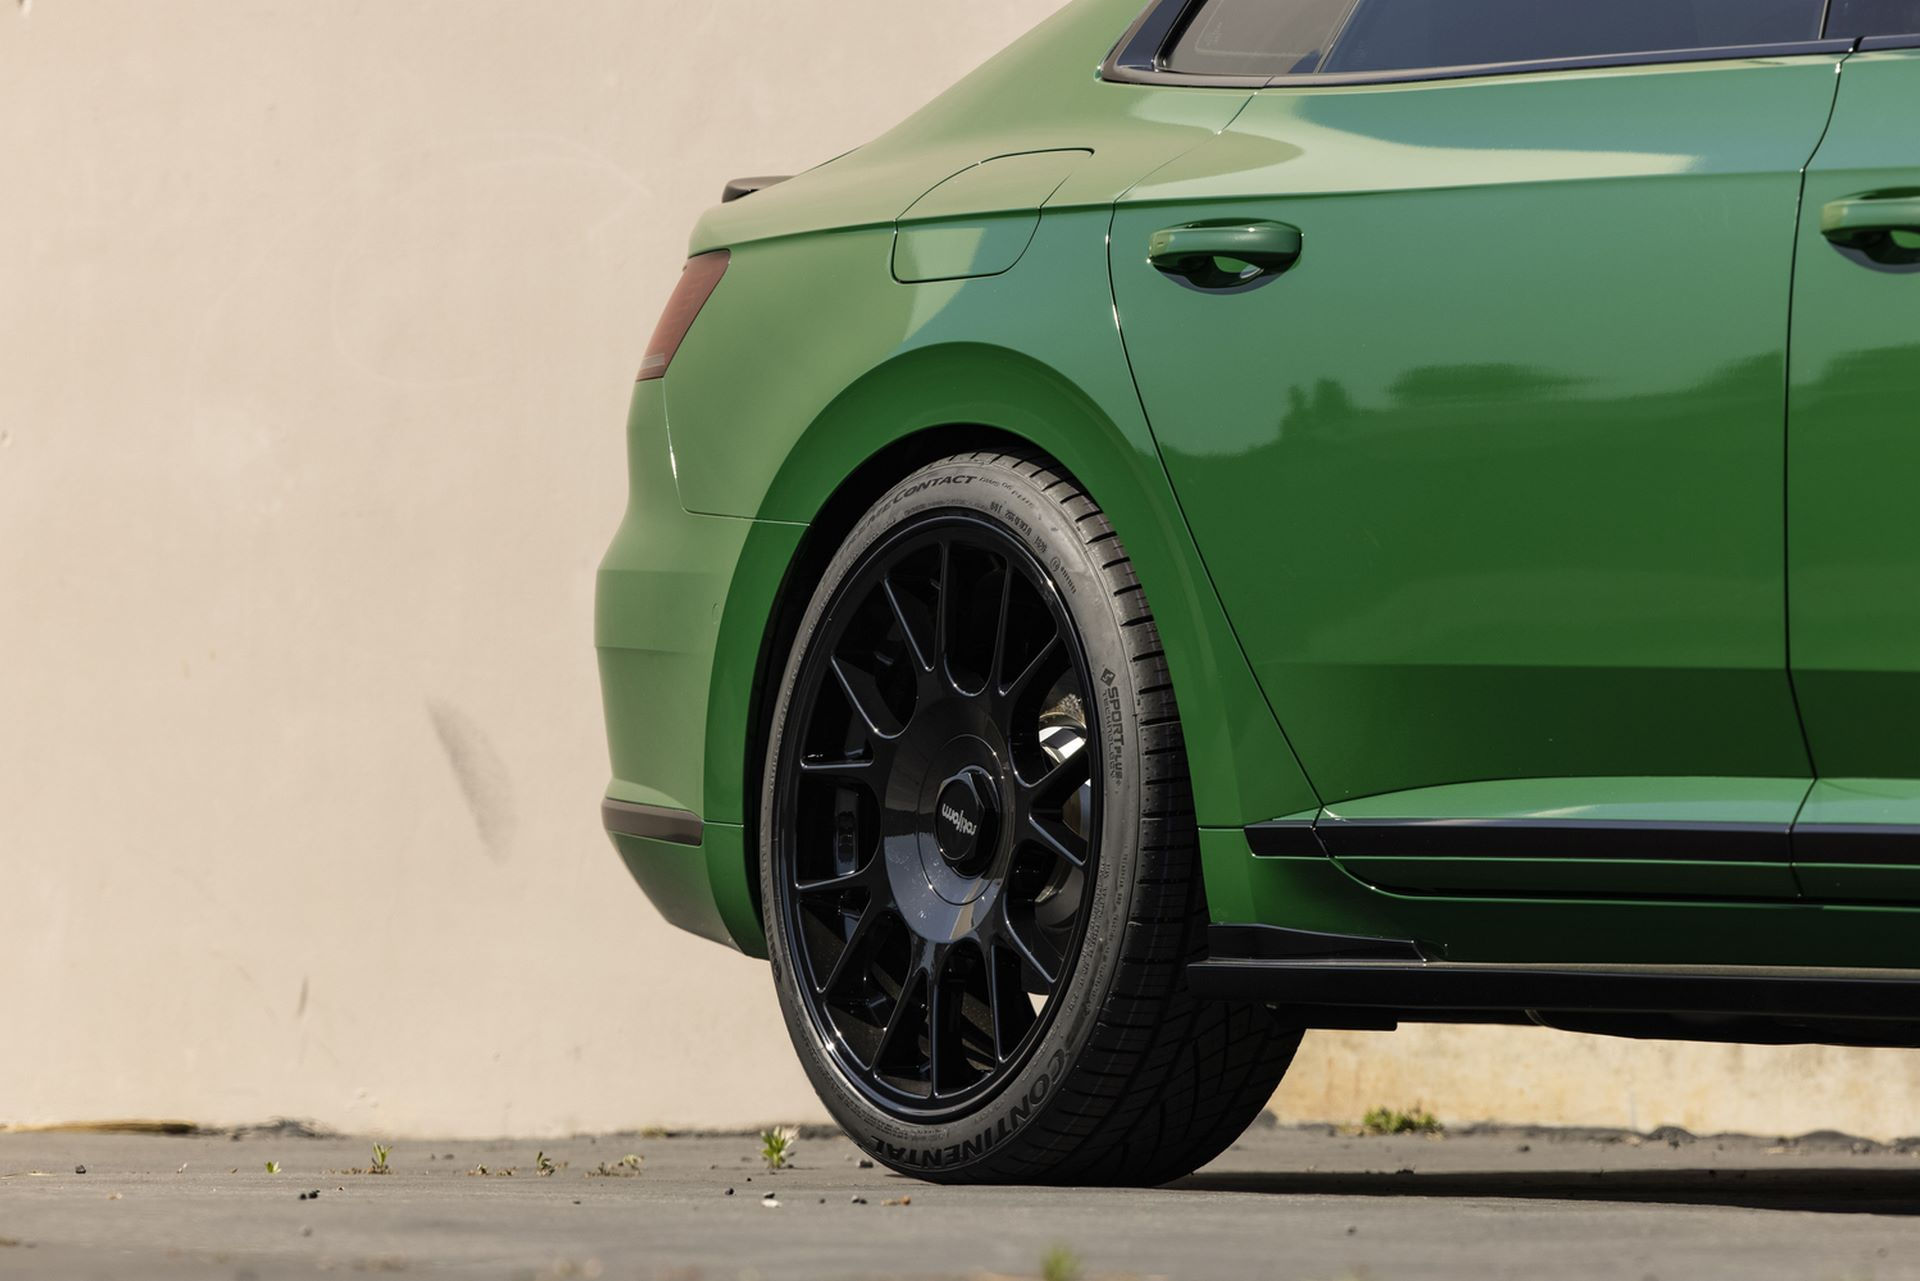 VW-Volkswagen-Arteon-Big-Sur-concept-5